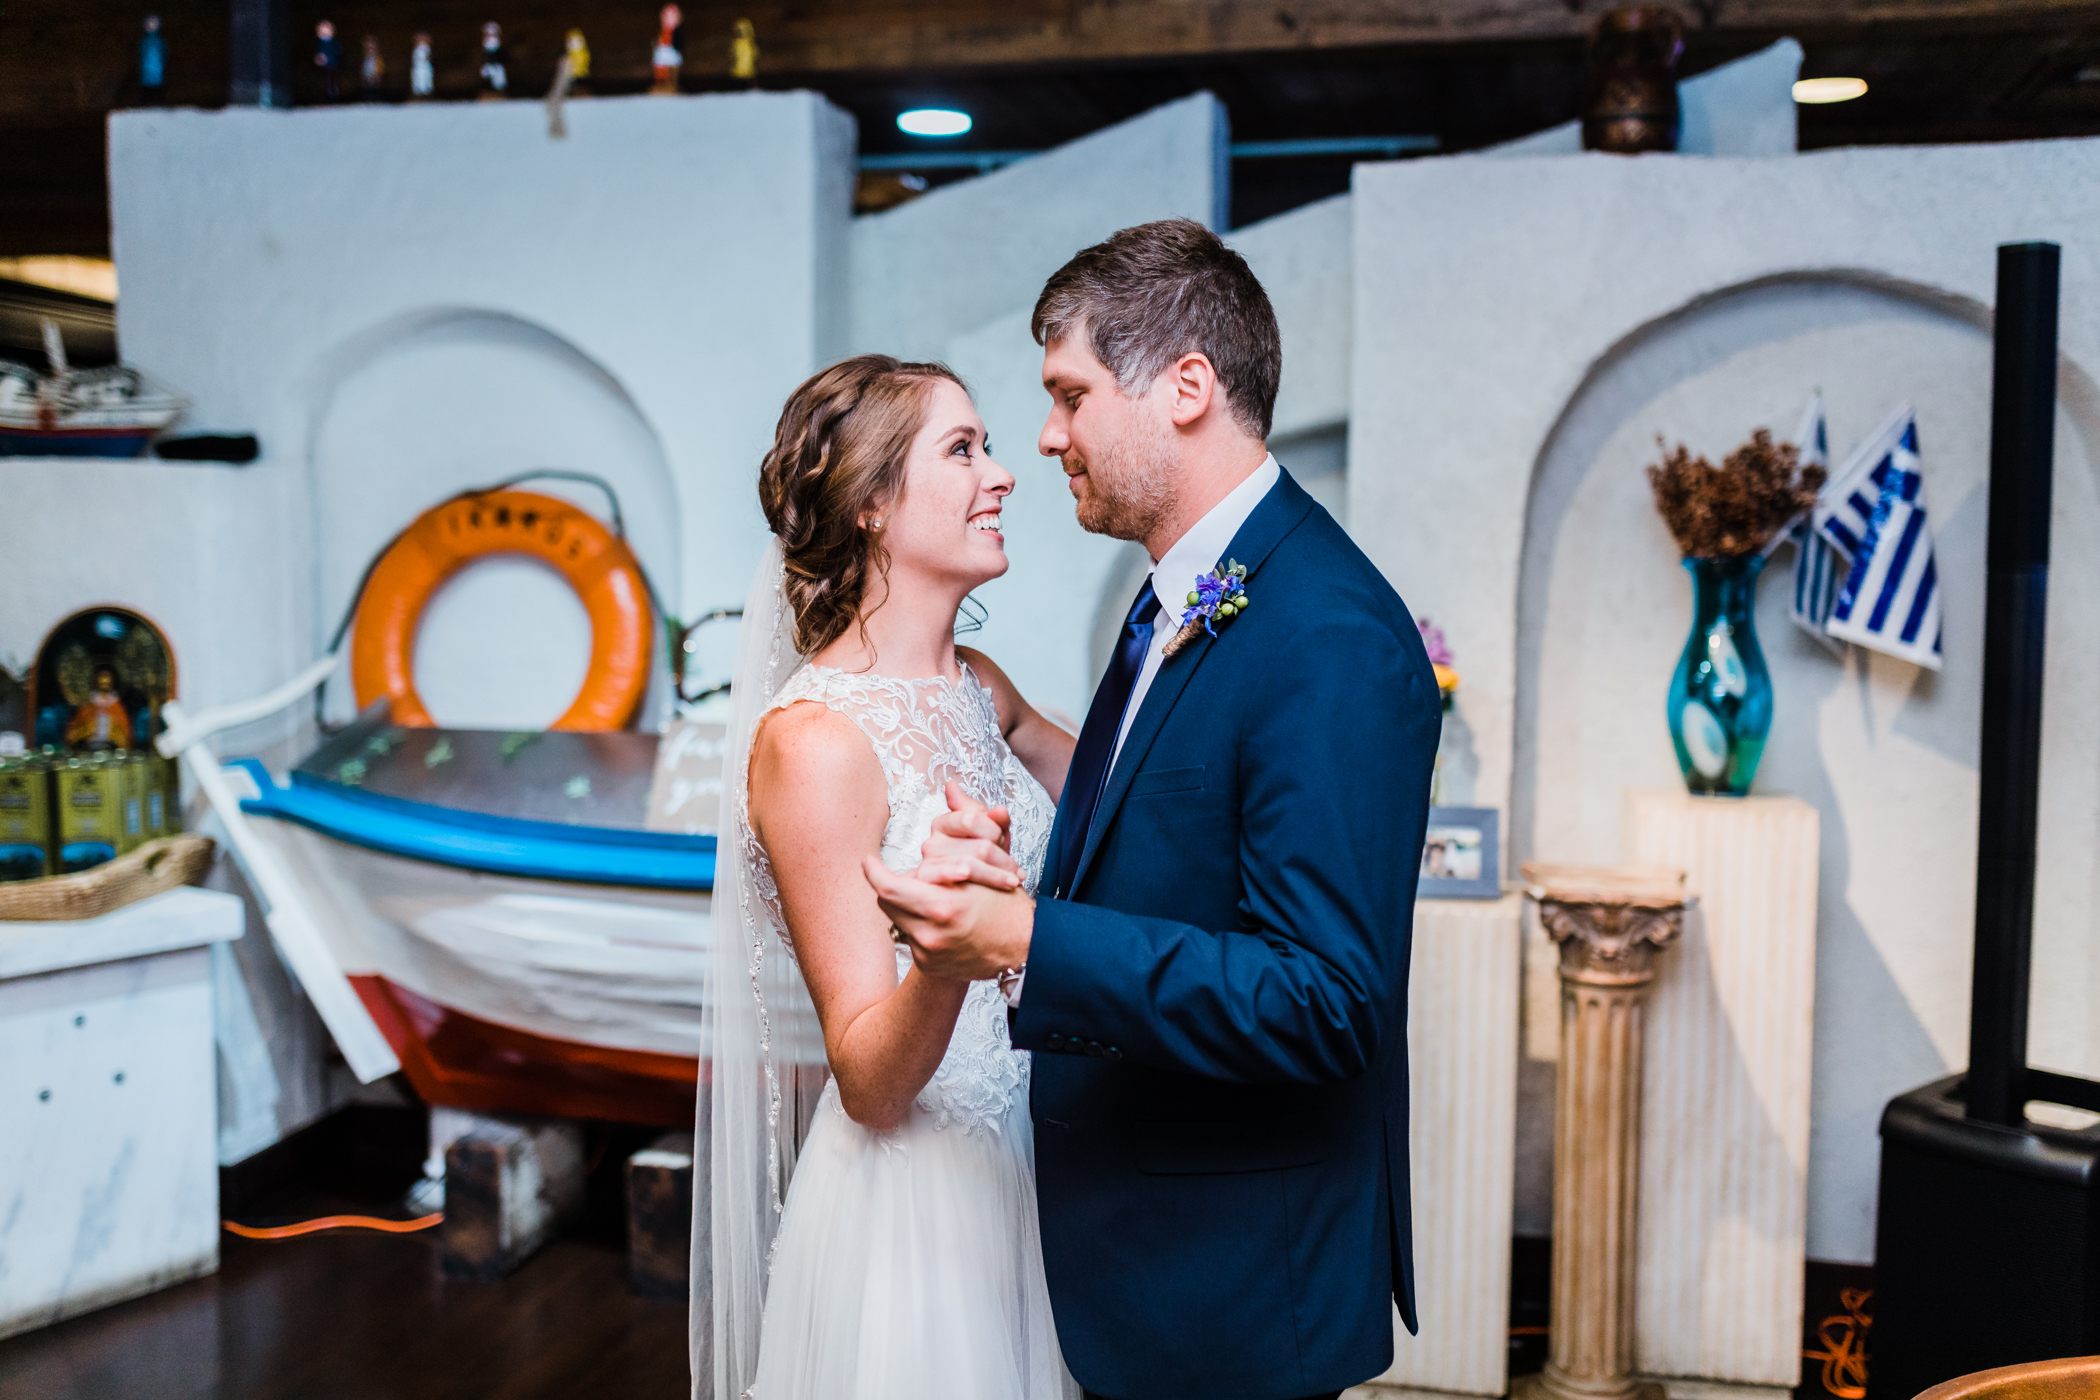 restaurant wedding reception in baltimore maryland - intimate baltimore weddings - md wedding photographer